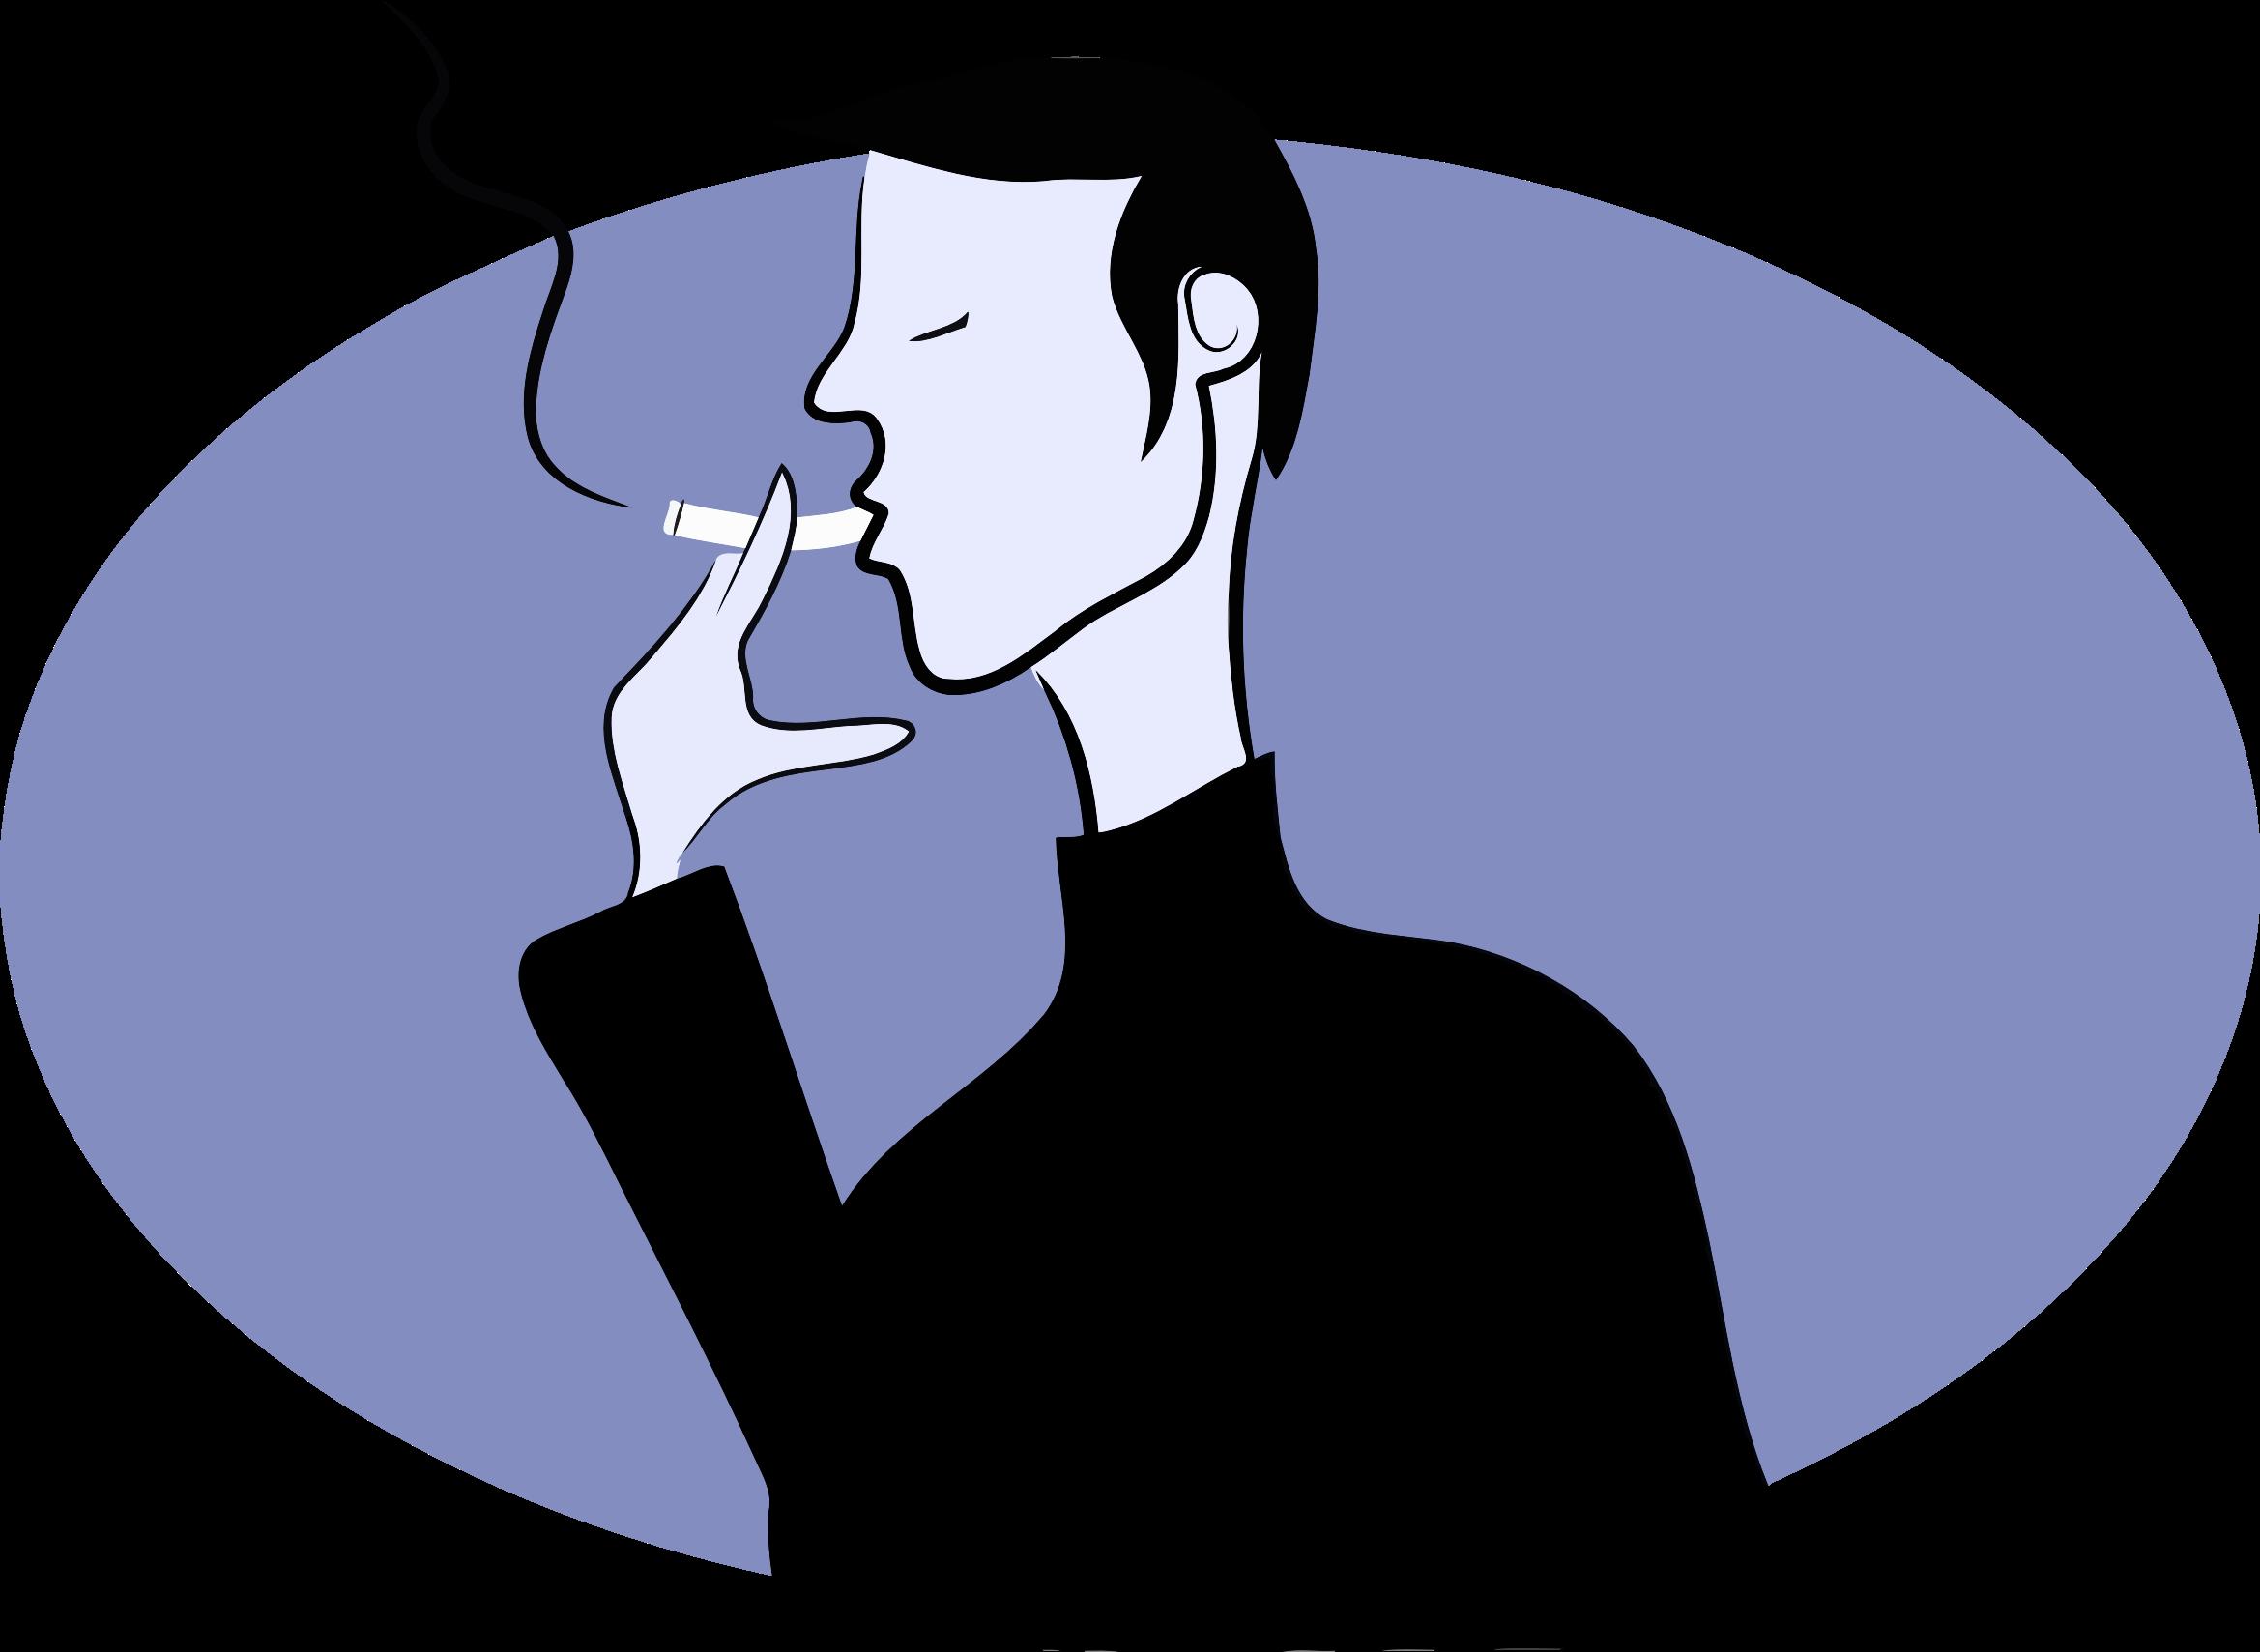 Medium Image - Man Smoking Clipart Png (780x571), Png Download